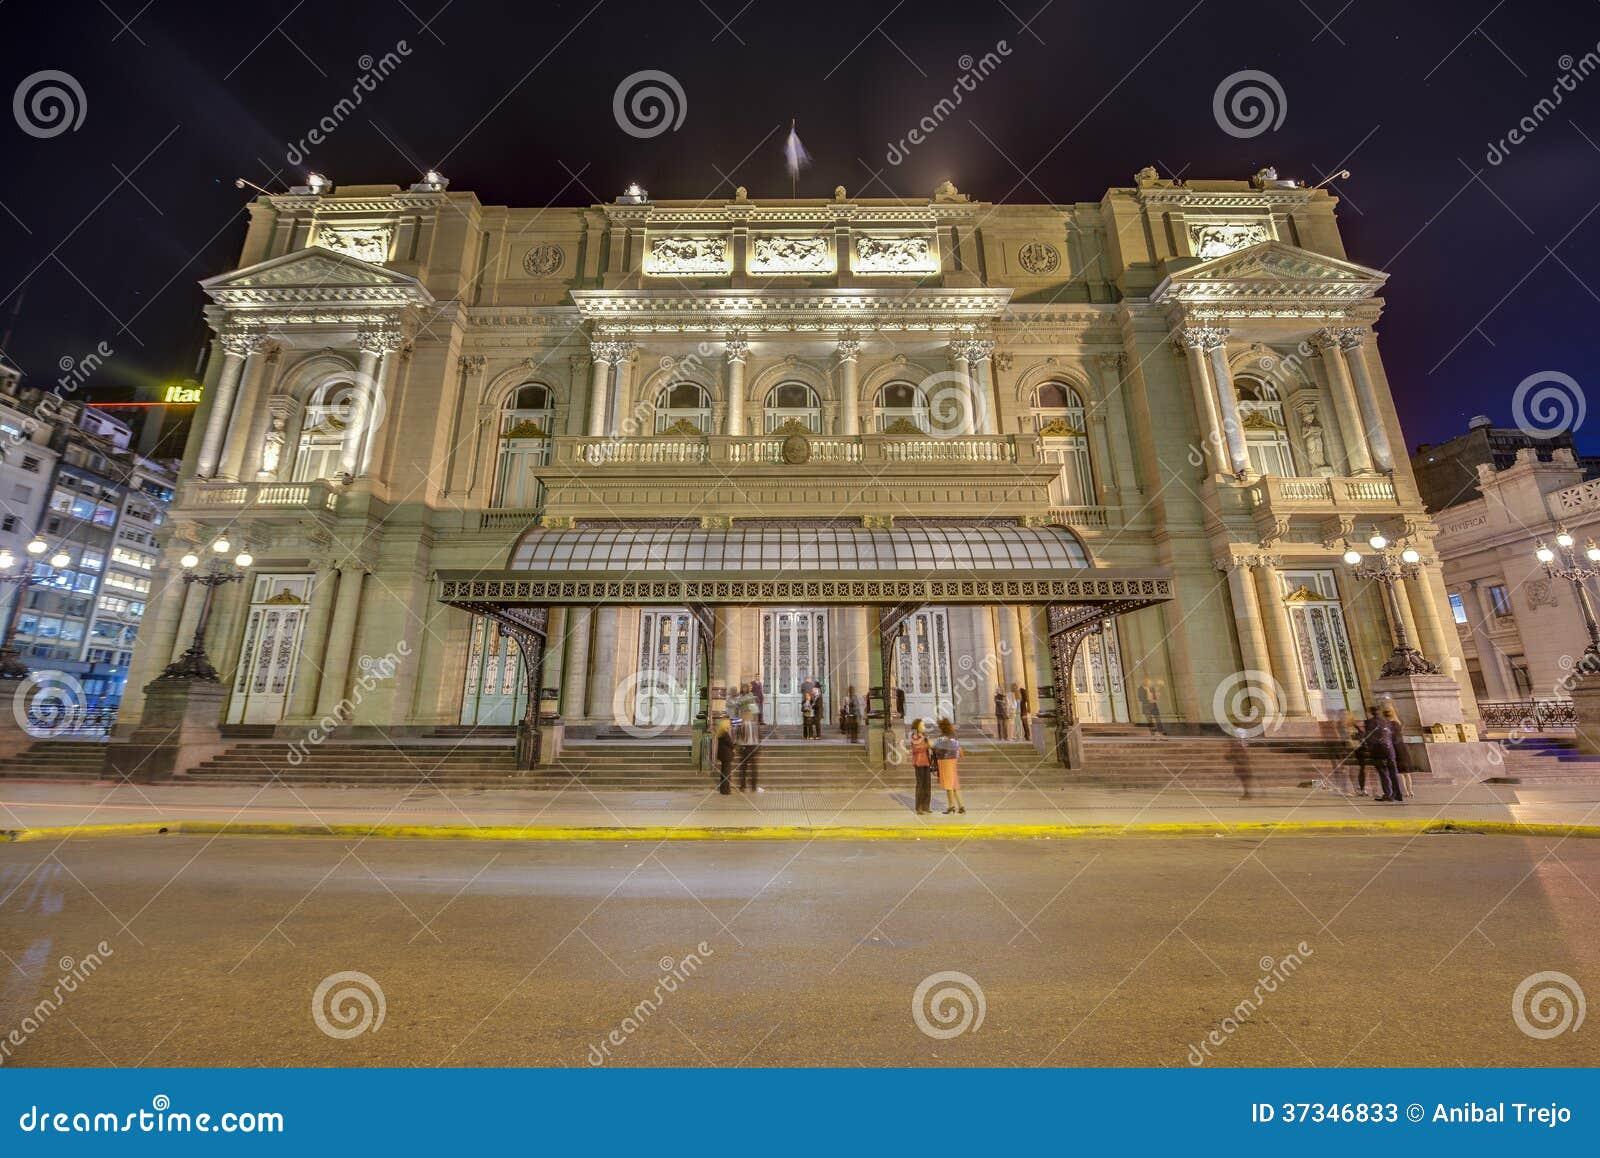 Kolonteater i Buenos Aires, Argentina.